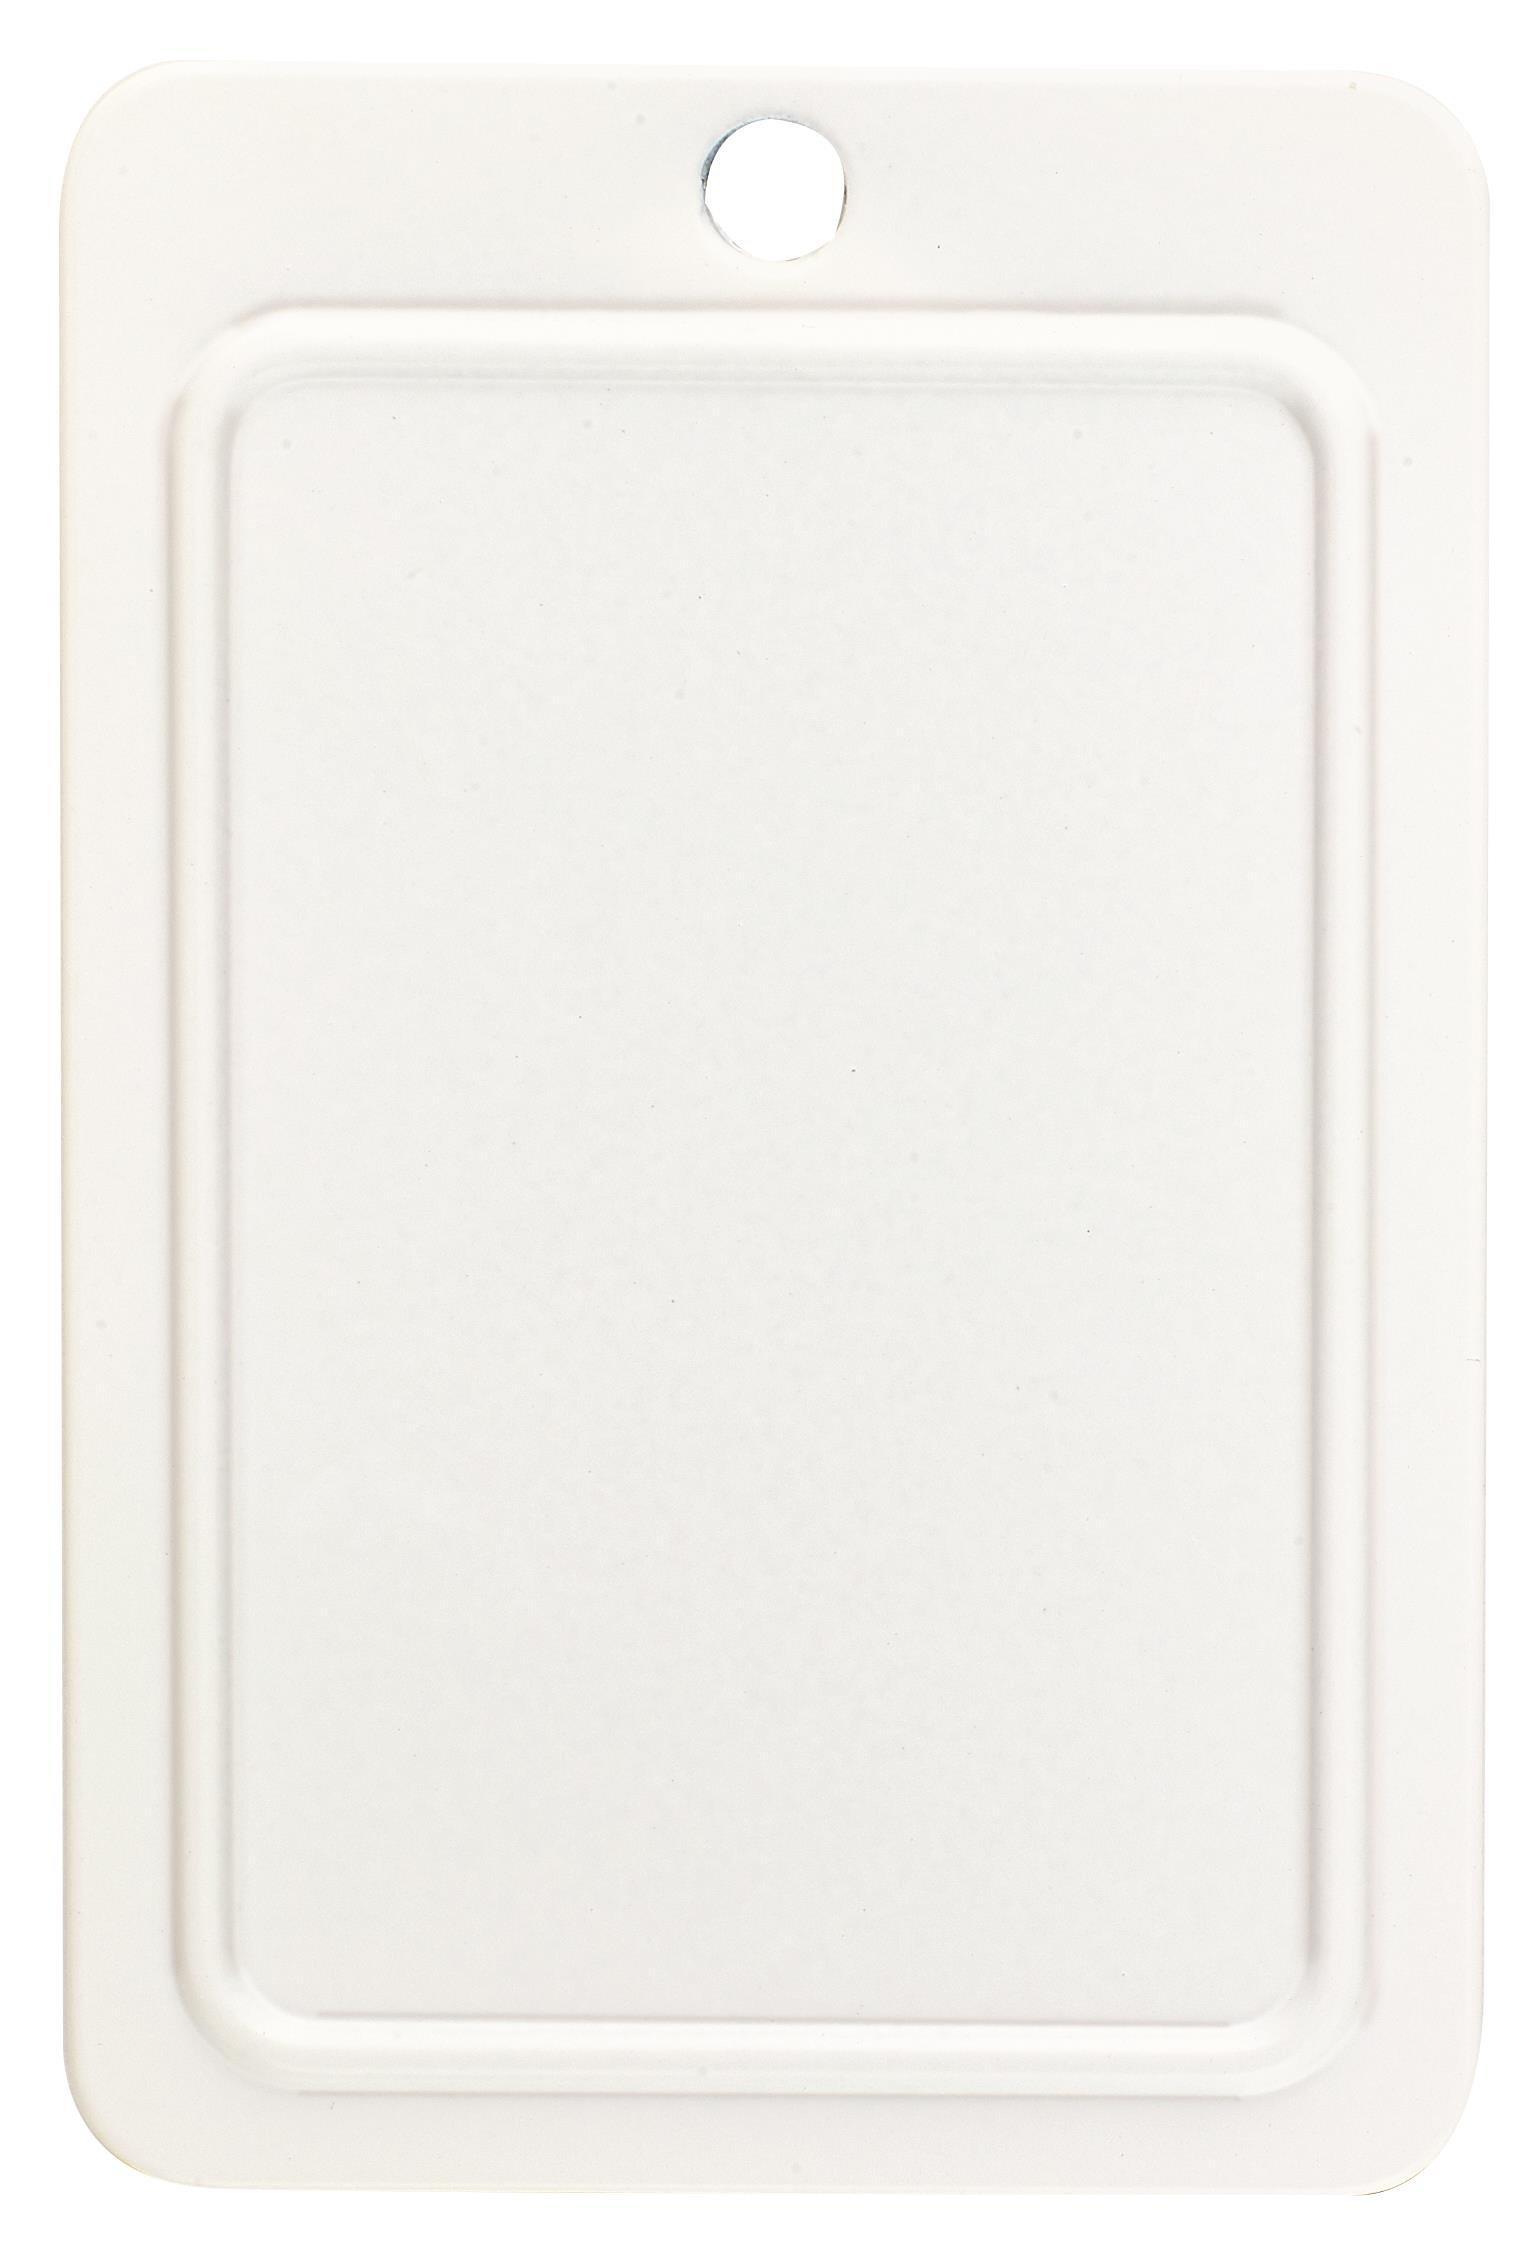 Amerock BP1920W Allison Value 1-1/4 in (32 mm) Diameter White Cabinet Knob